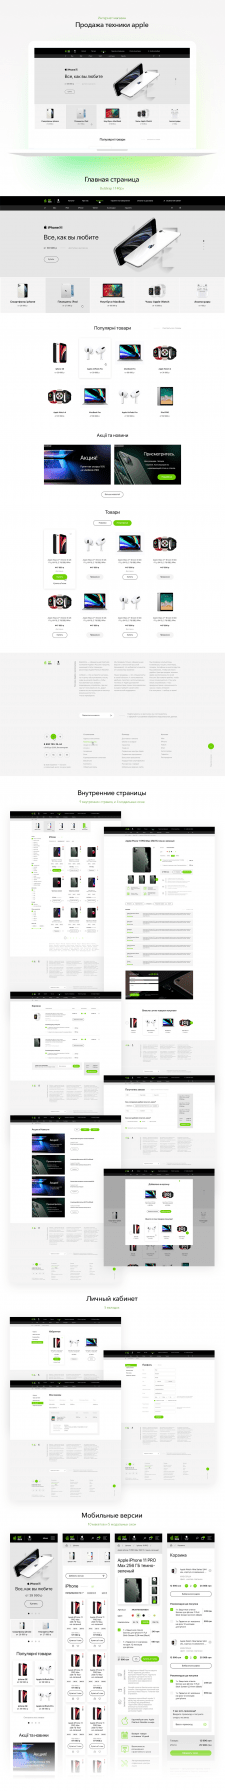 Дизайн интернет магазина техники apple